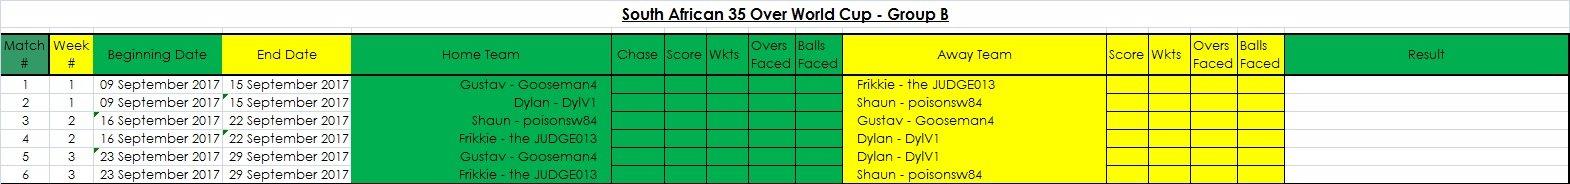 Fixtures Group B.jpg